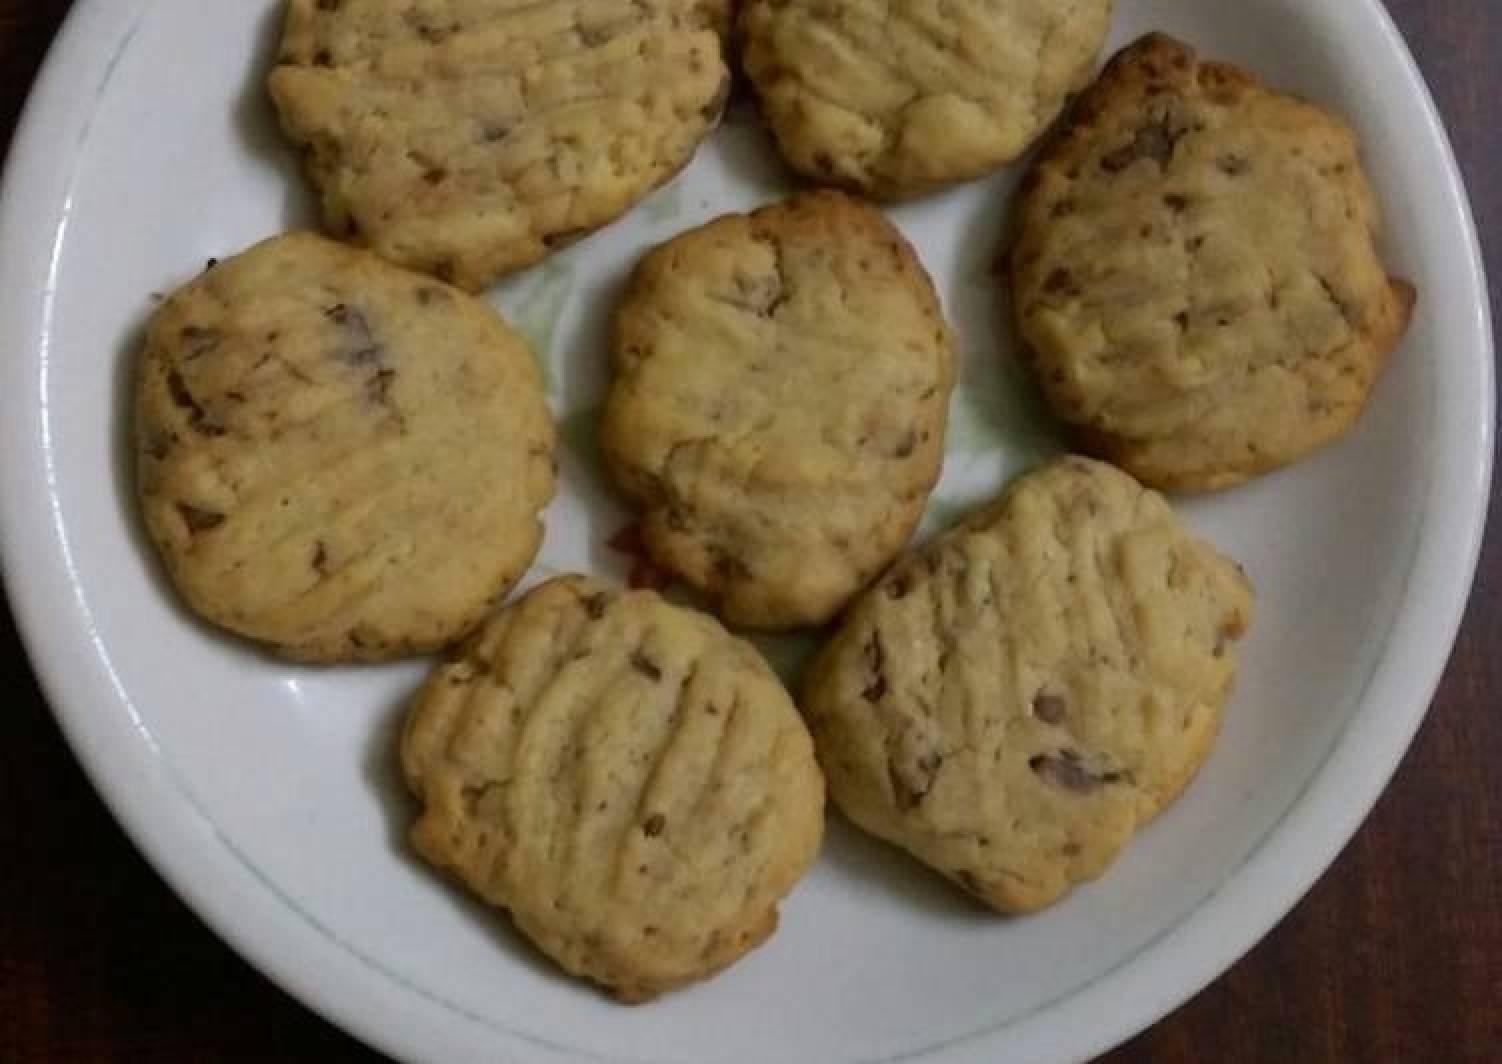 Chocolate chip cookies #4week's challenge